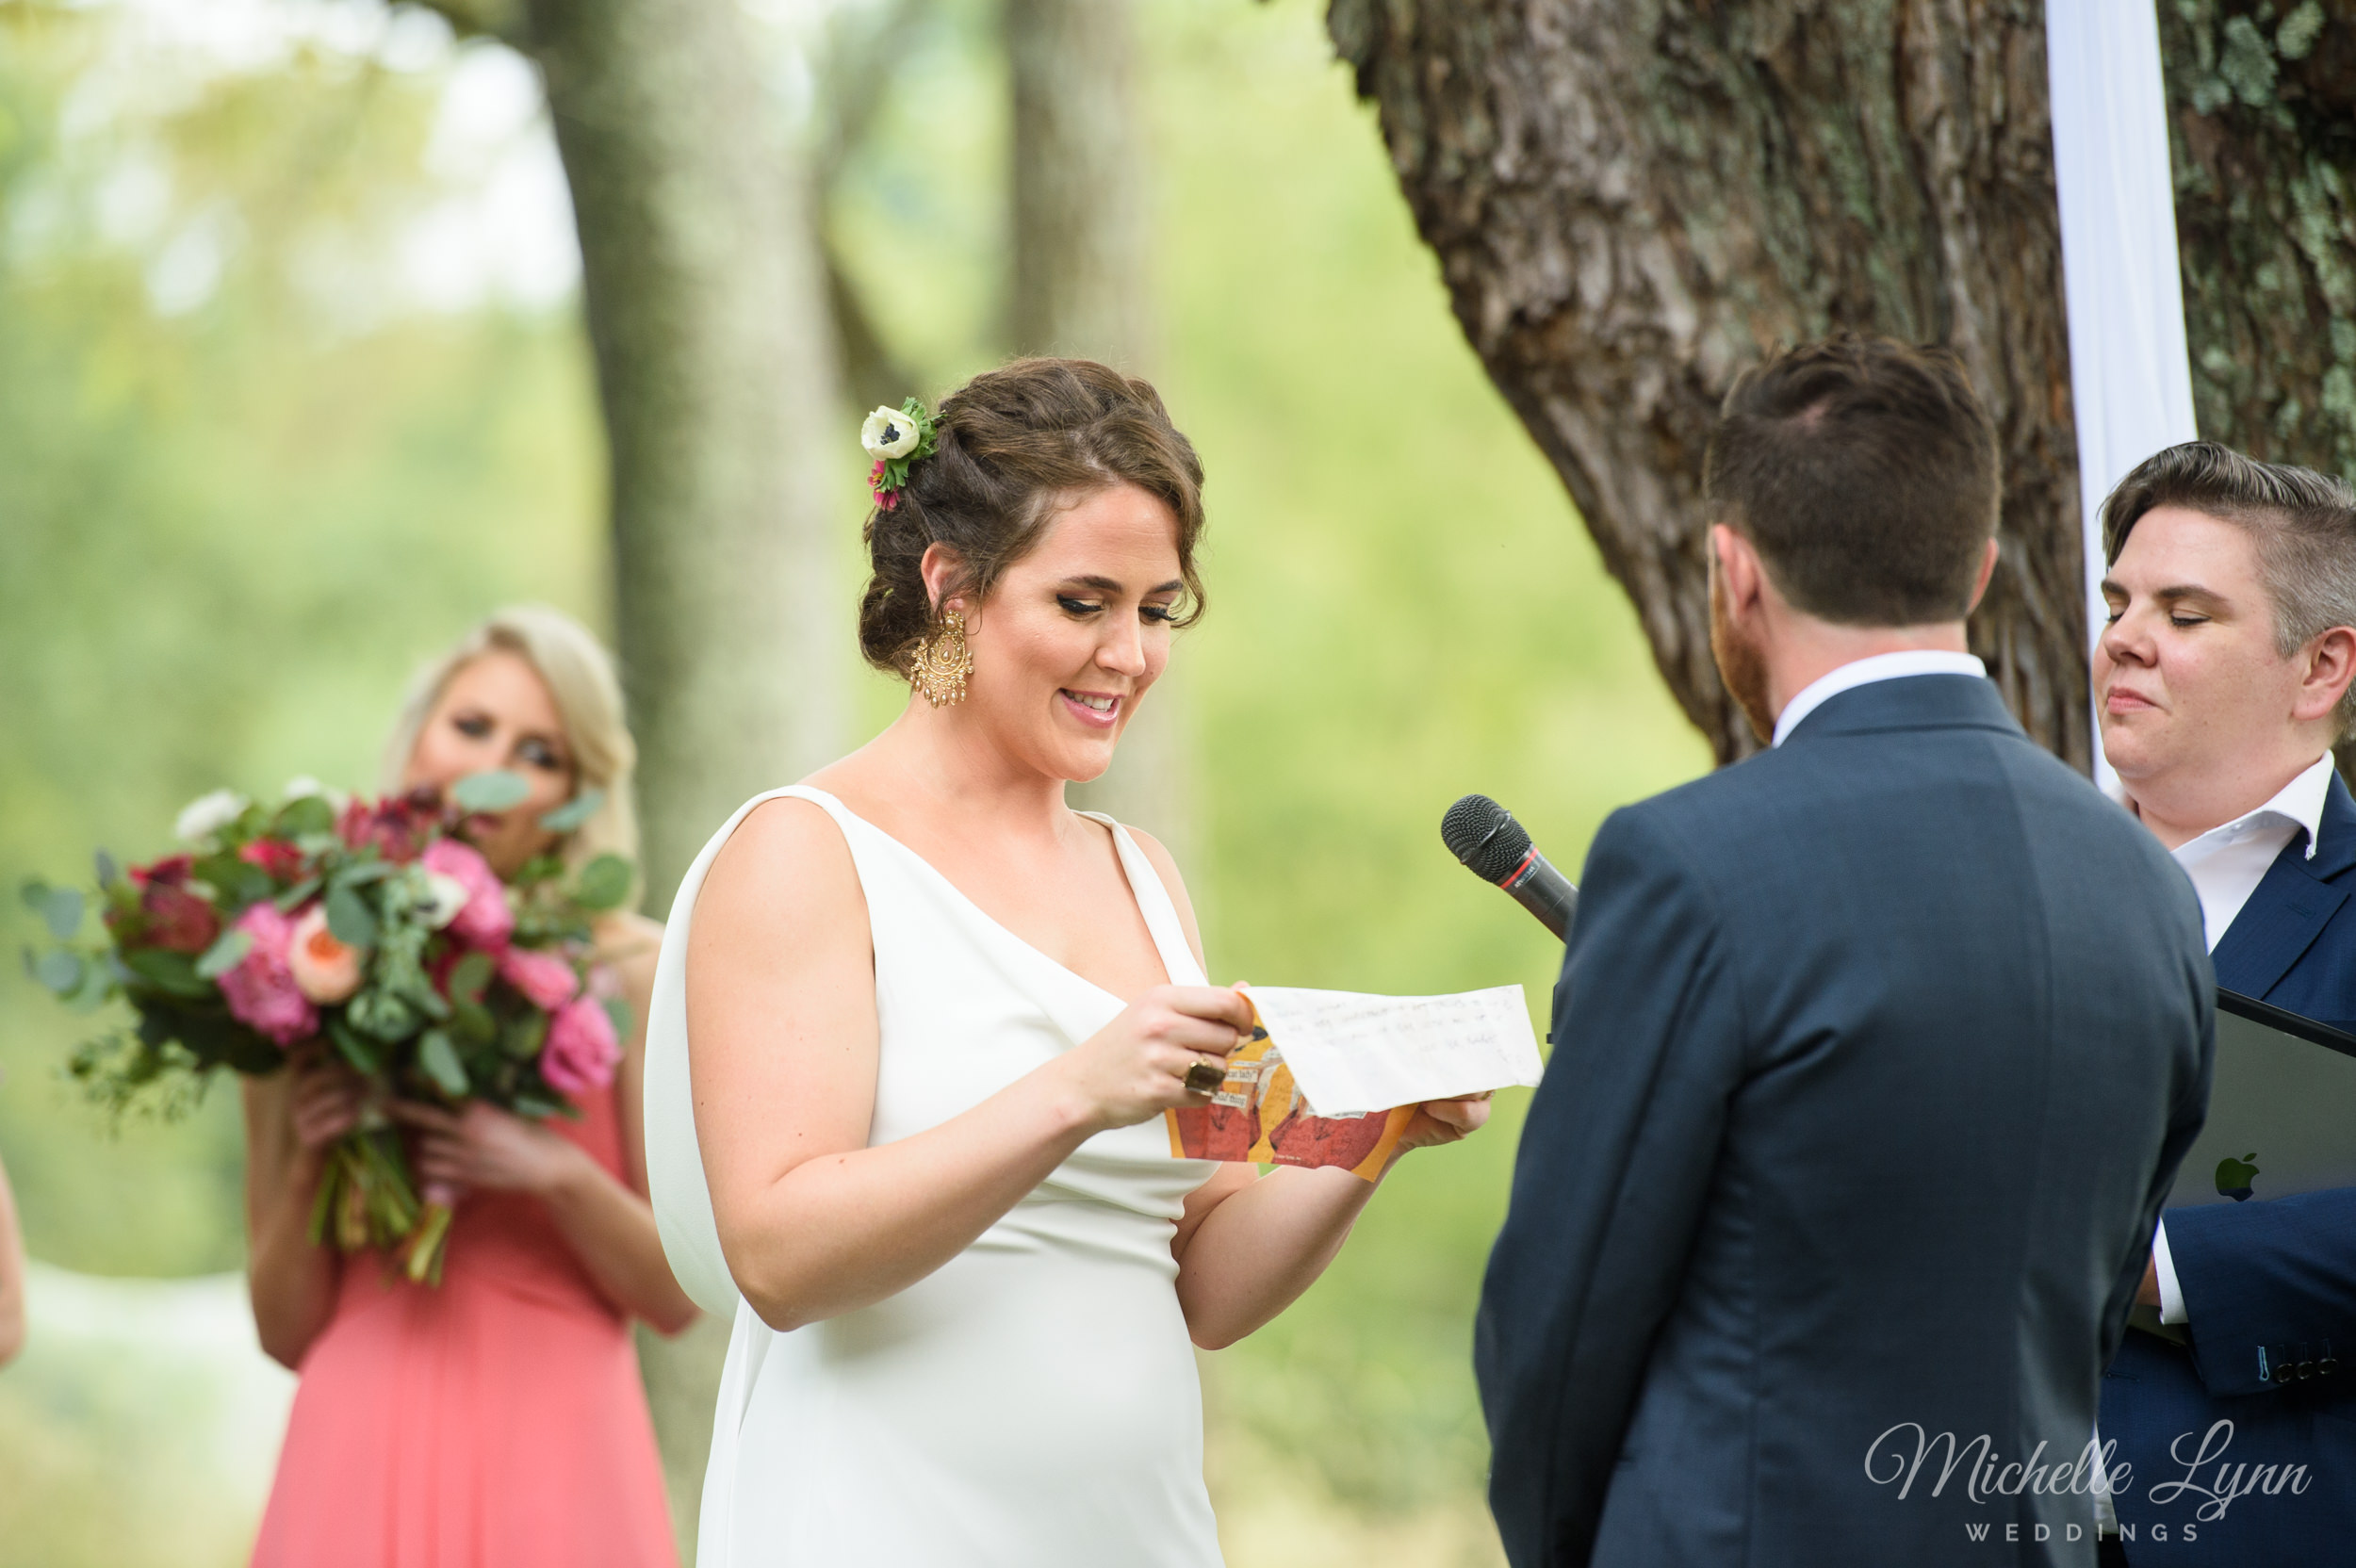 mlw-unionville-vineyards-nj-wedding-photography-40.jpg